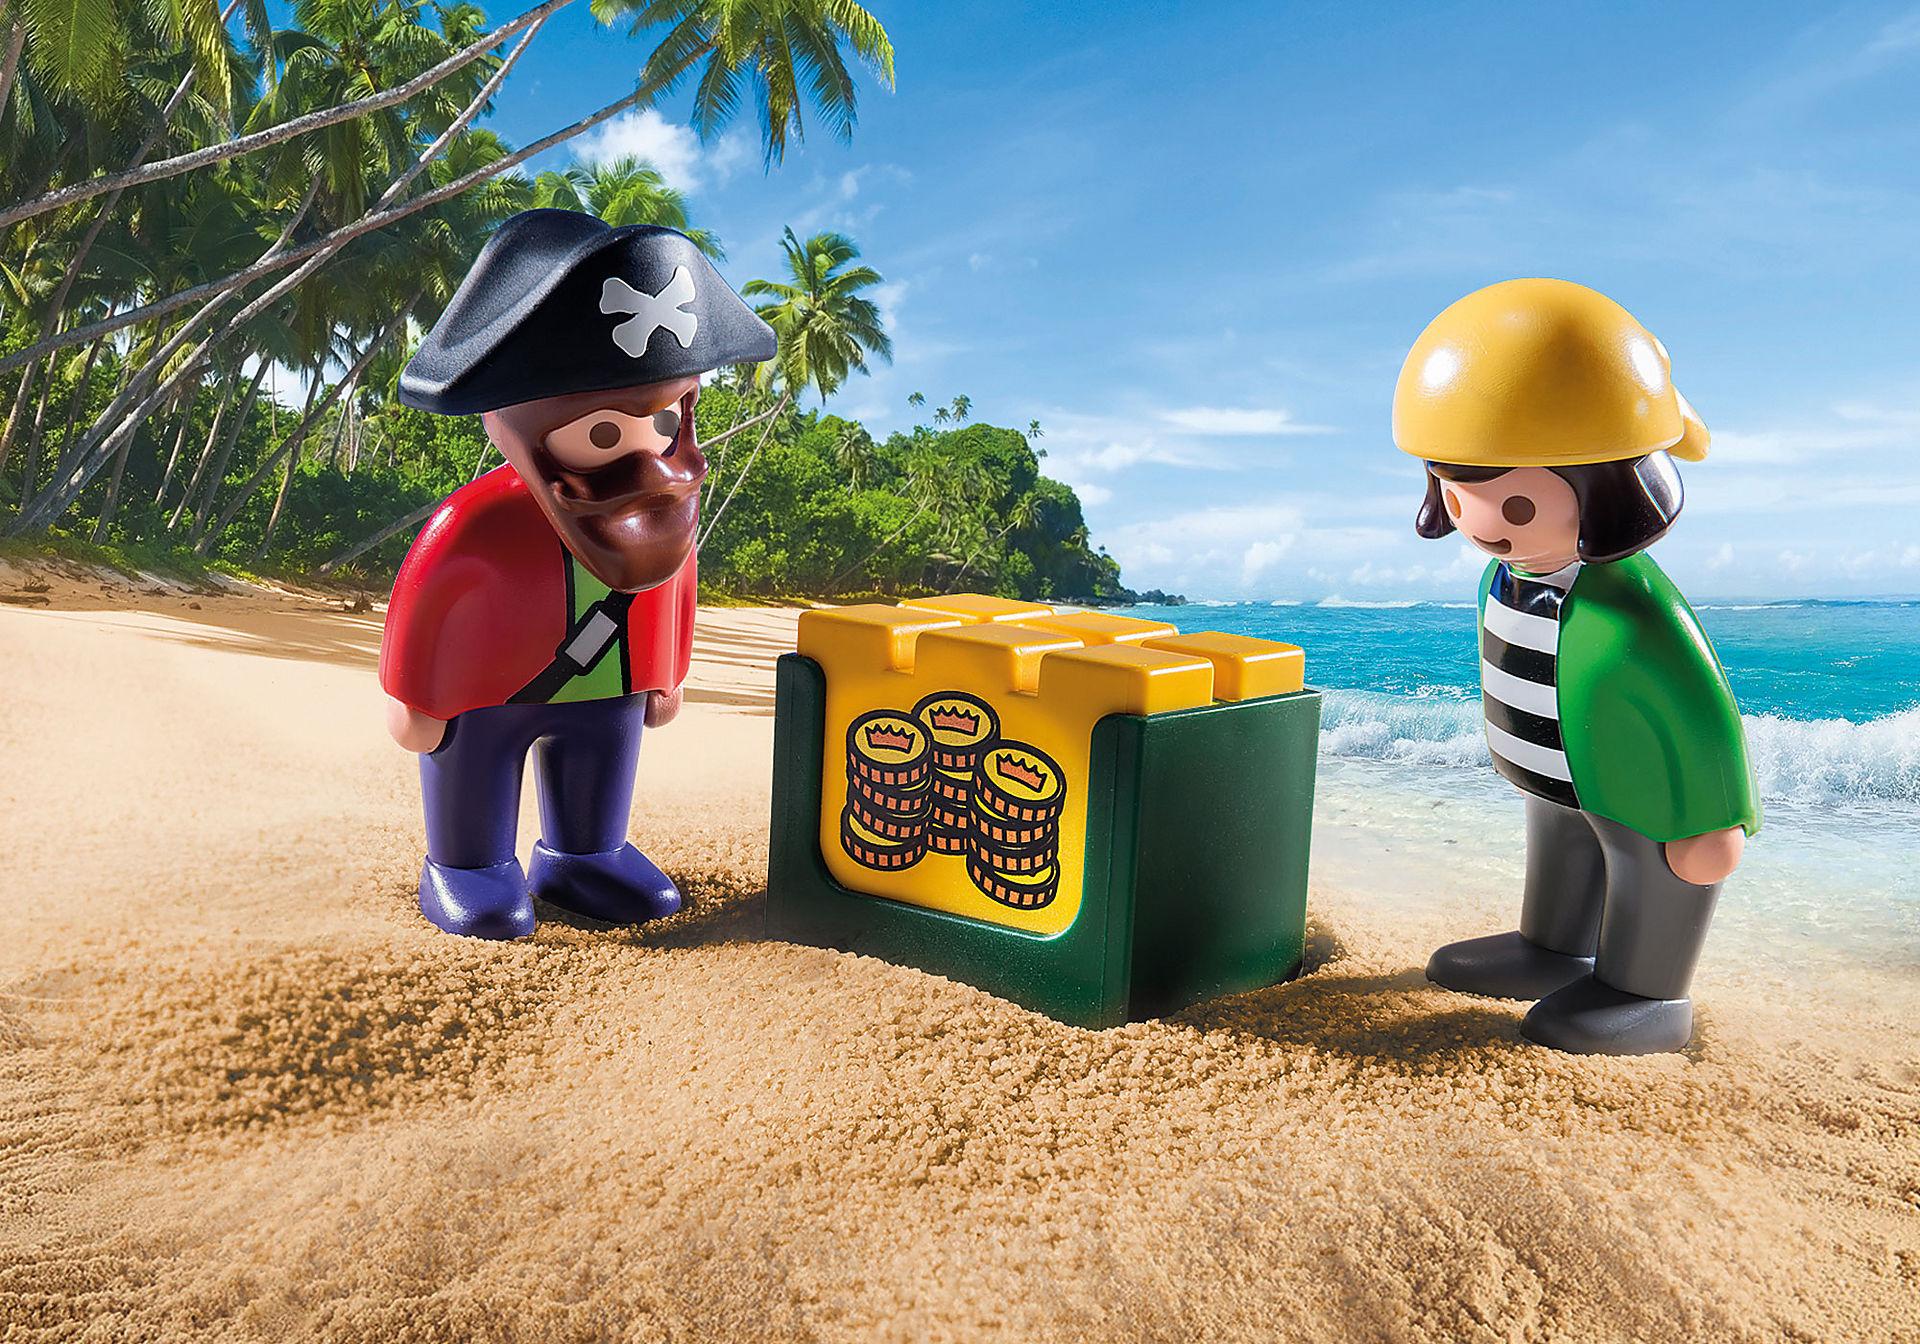 http://media.playmobil.com/i/playmobil/9118_product_extra1/Nave dei Pirati 1.2.3